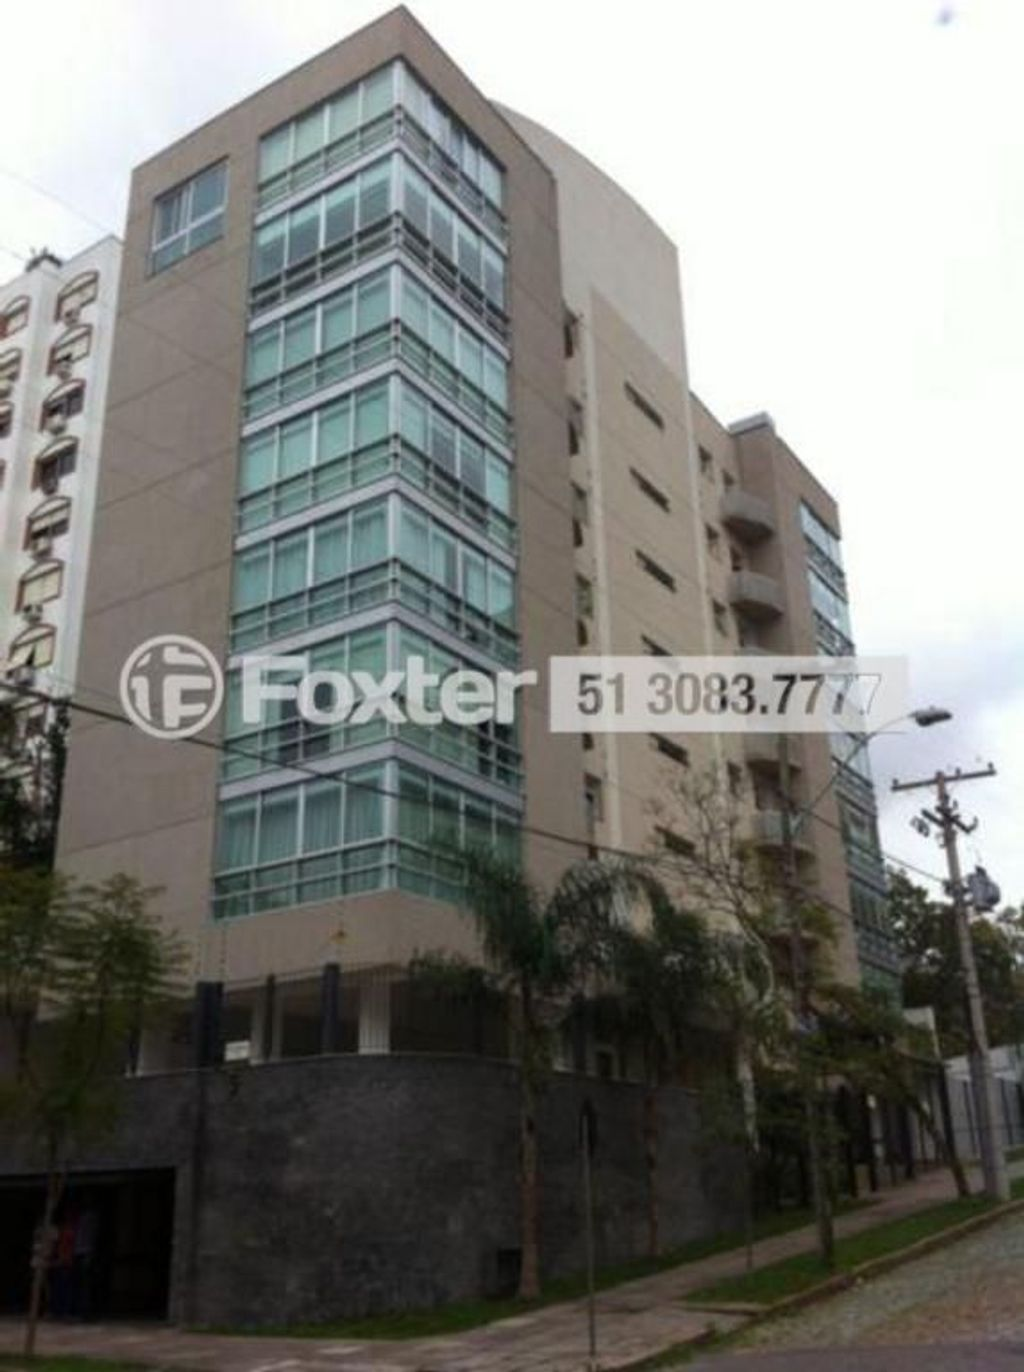 Aussie Square - Apto 2 Dorm, Petrópolis, Porto Alegre (6110) - Foto 2